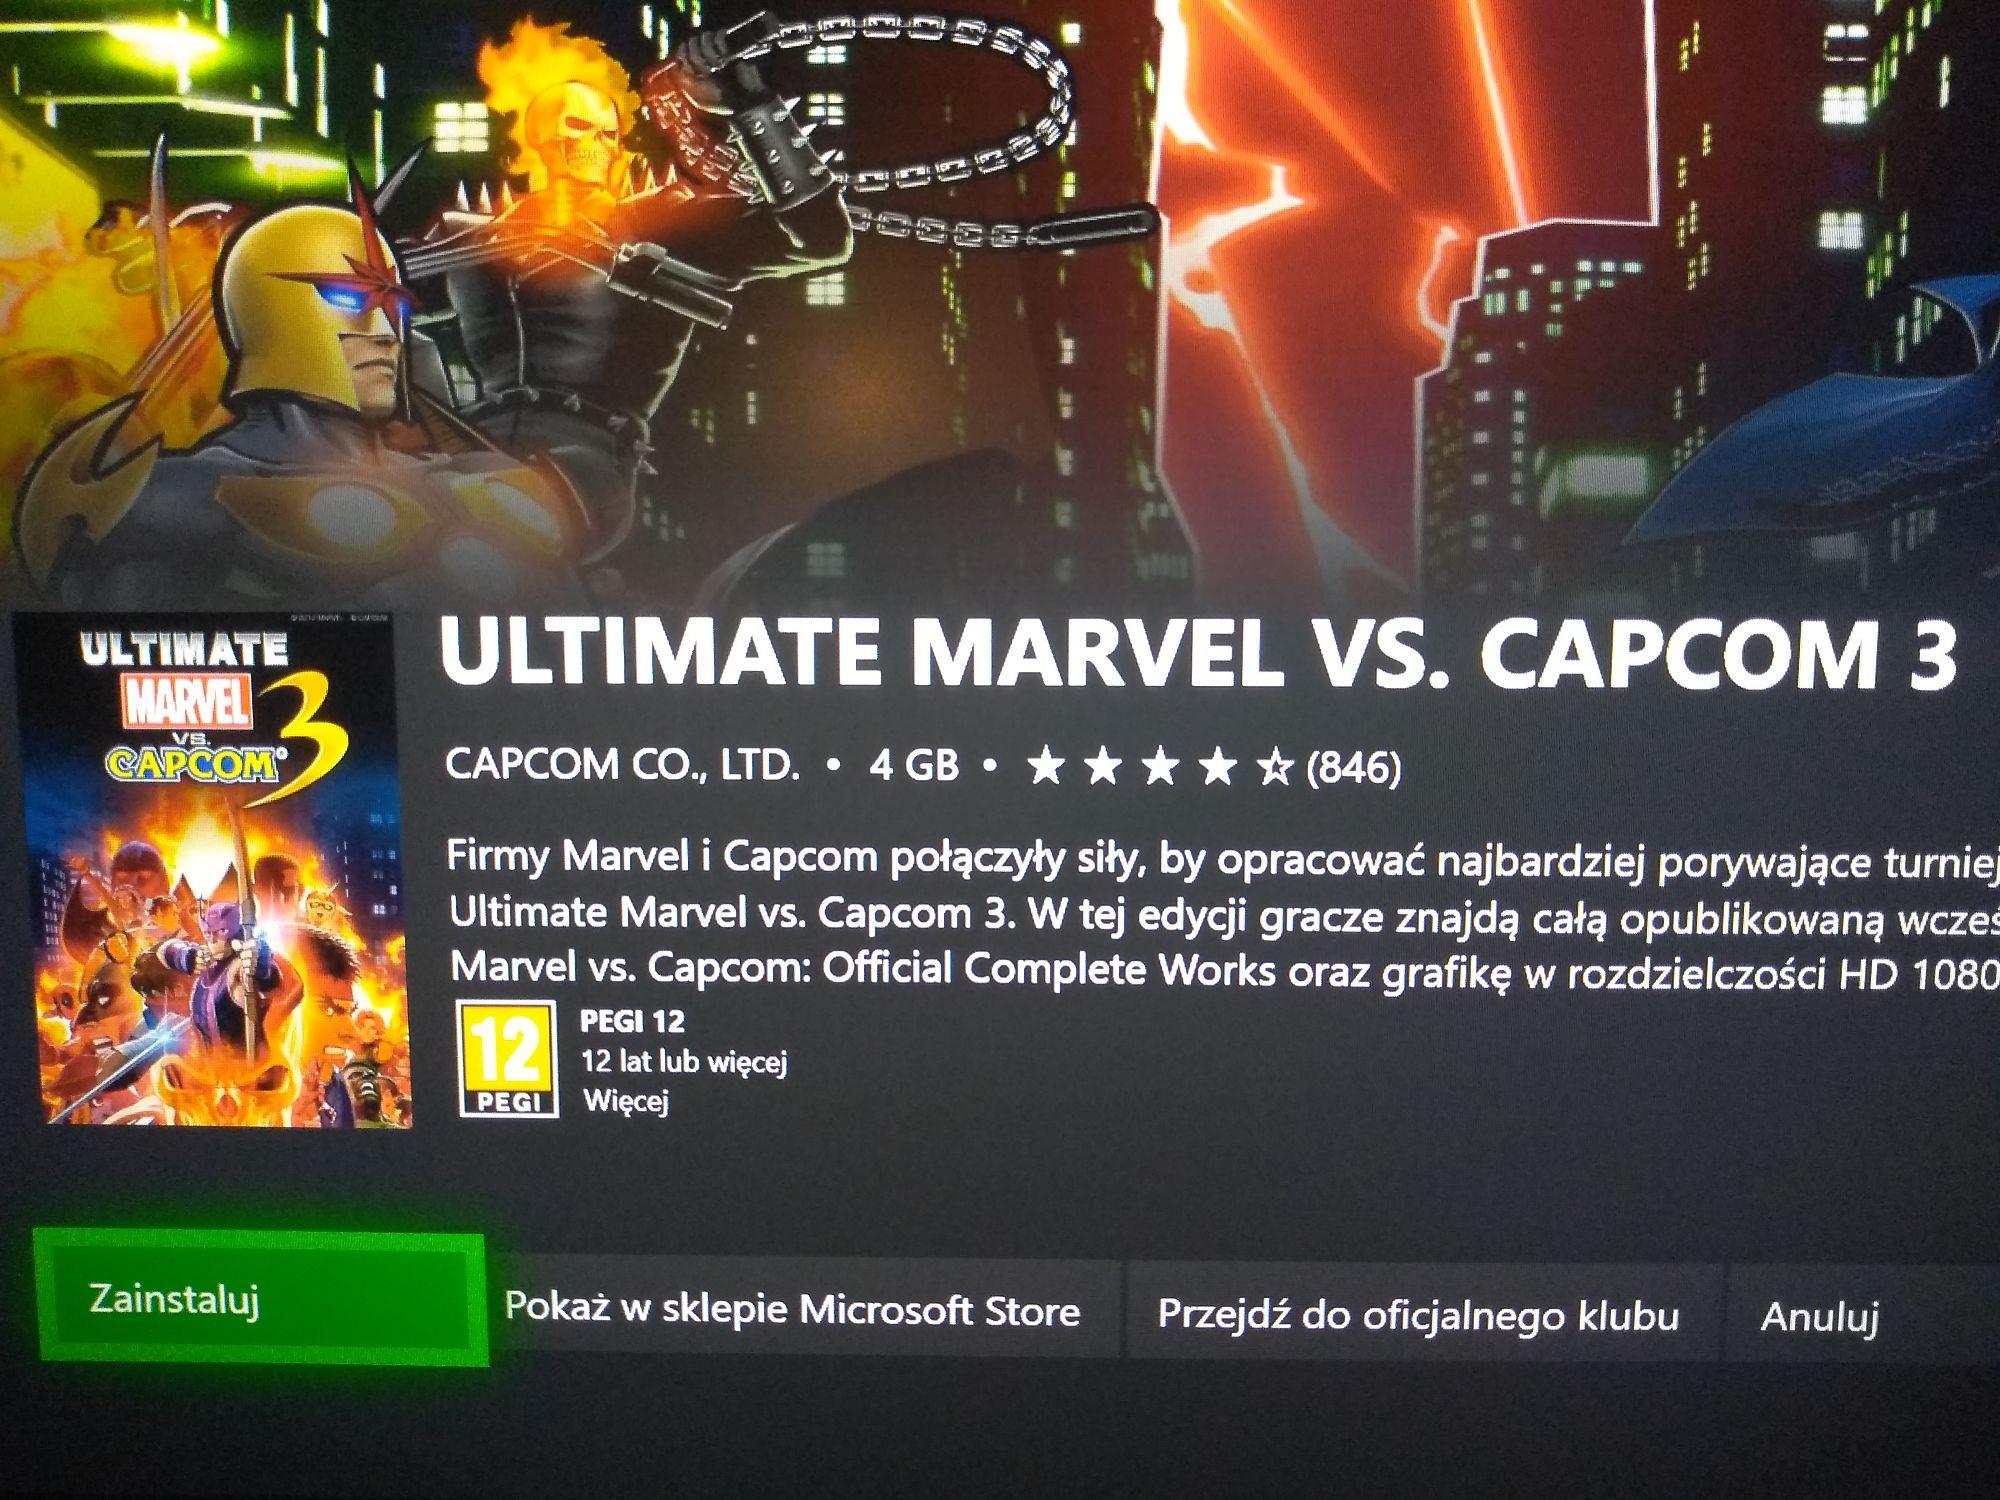 Ultimate Marvel vs. Capcom 3 w gamepass Xbox One